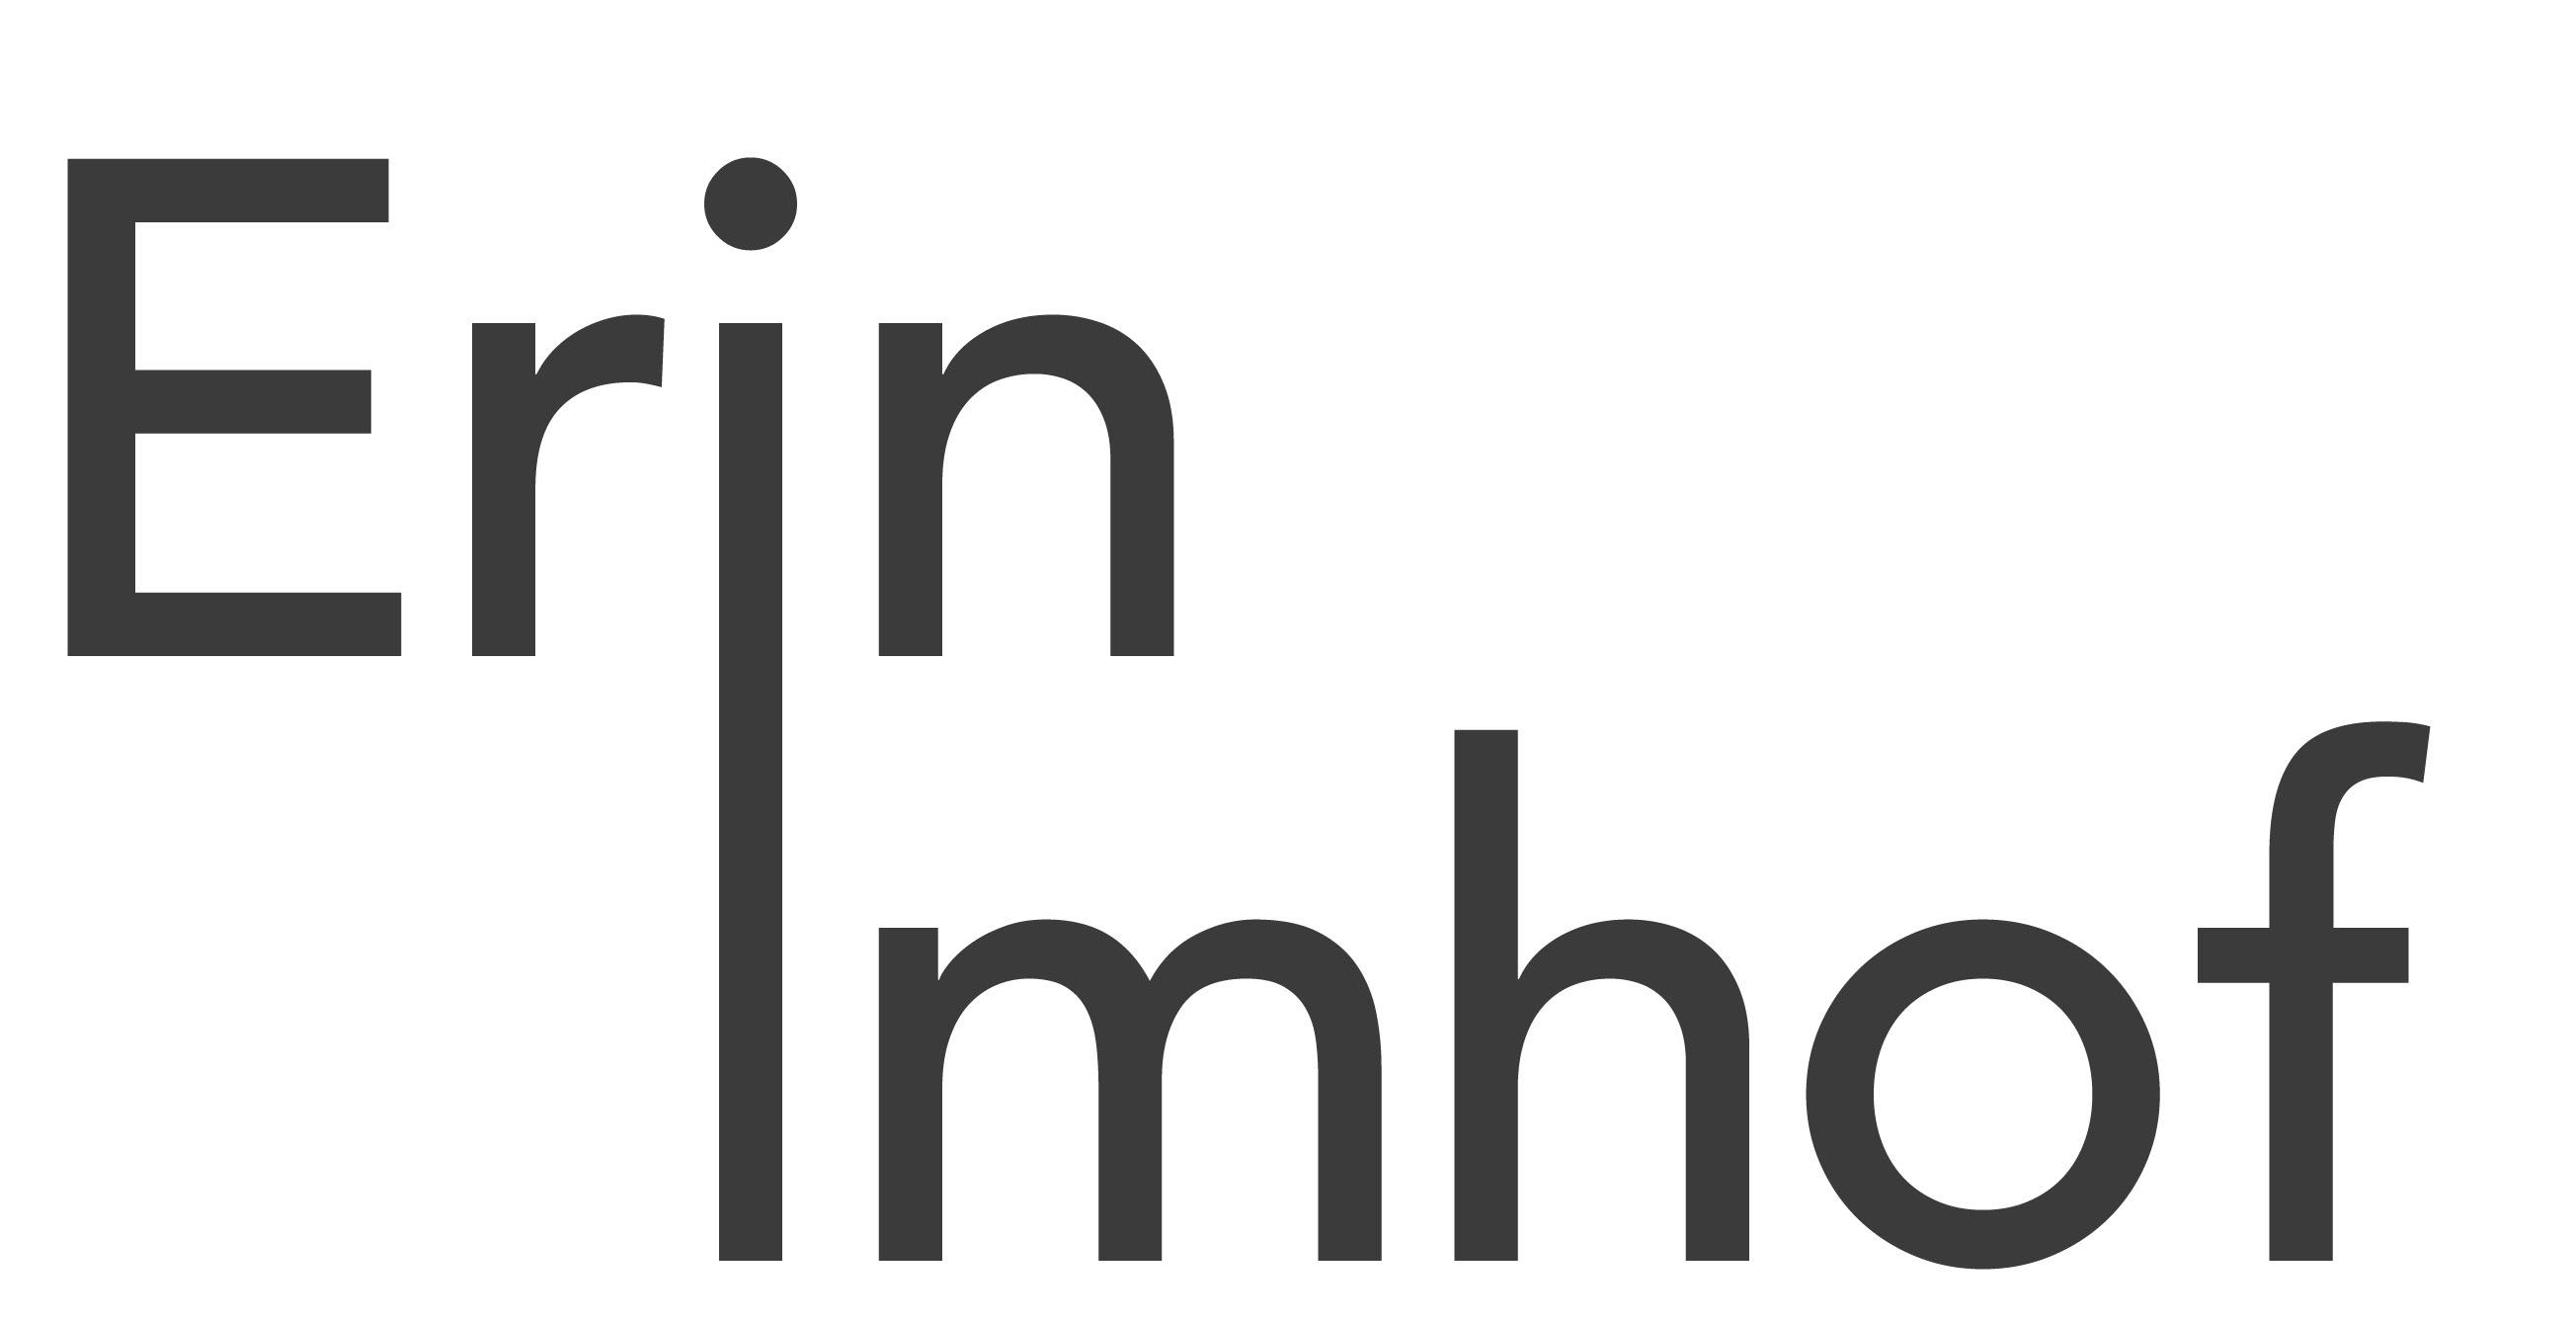 Erin Imhof